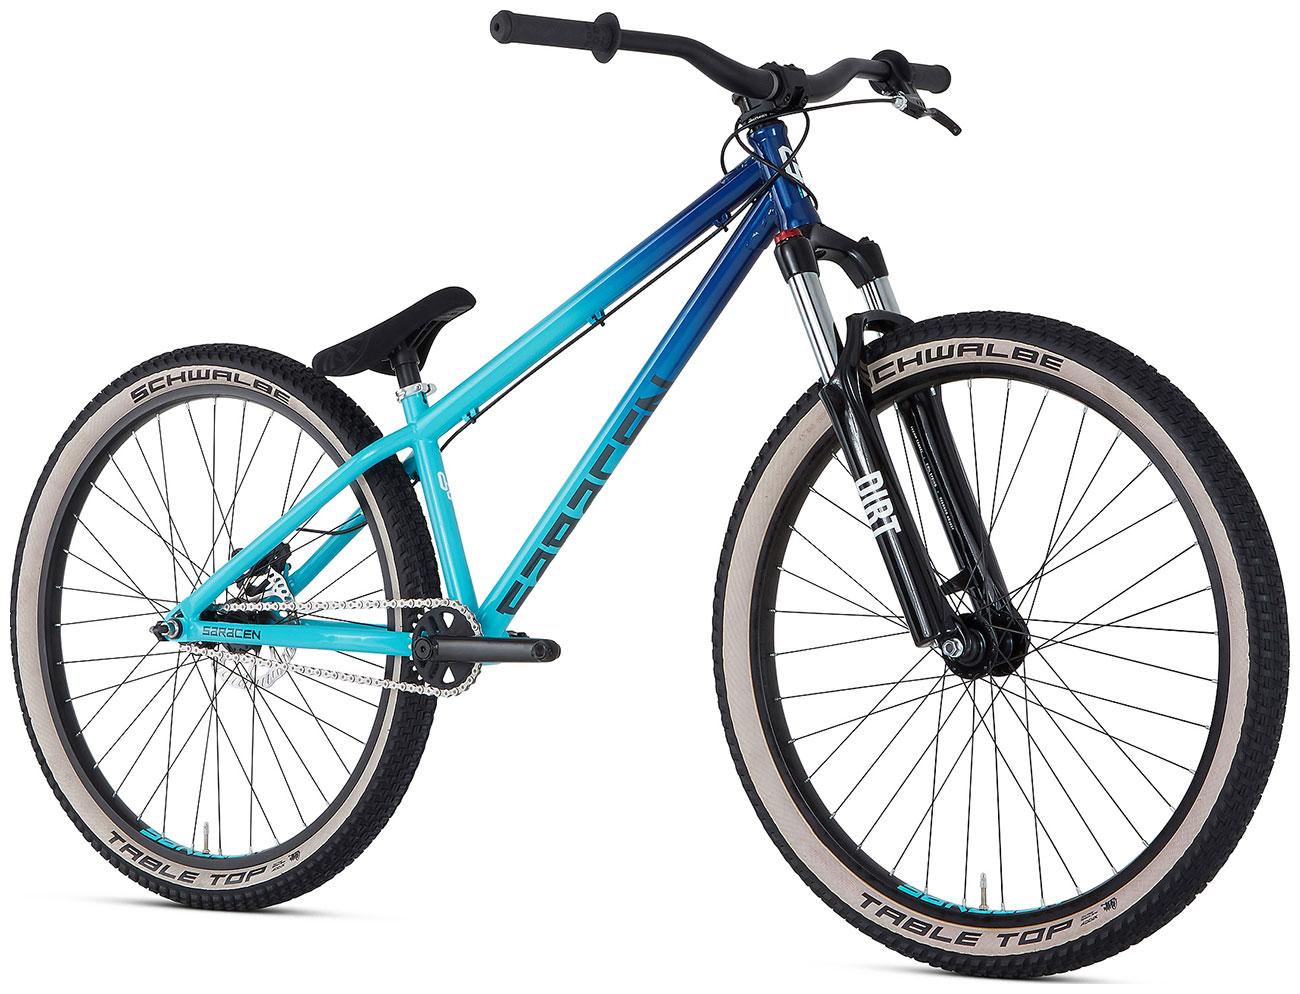 Saracen Amplitude Cr2 2019 Dirt Jump Bike